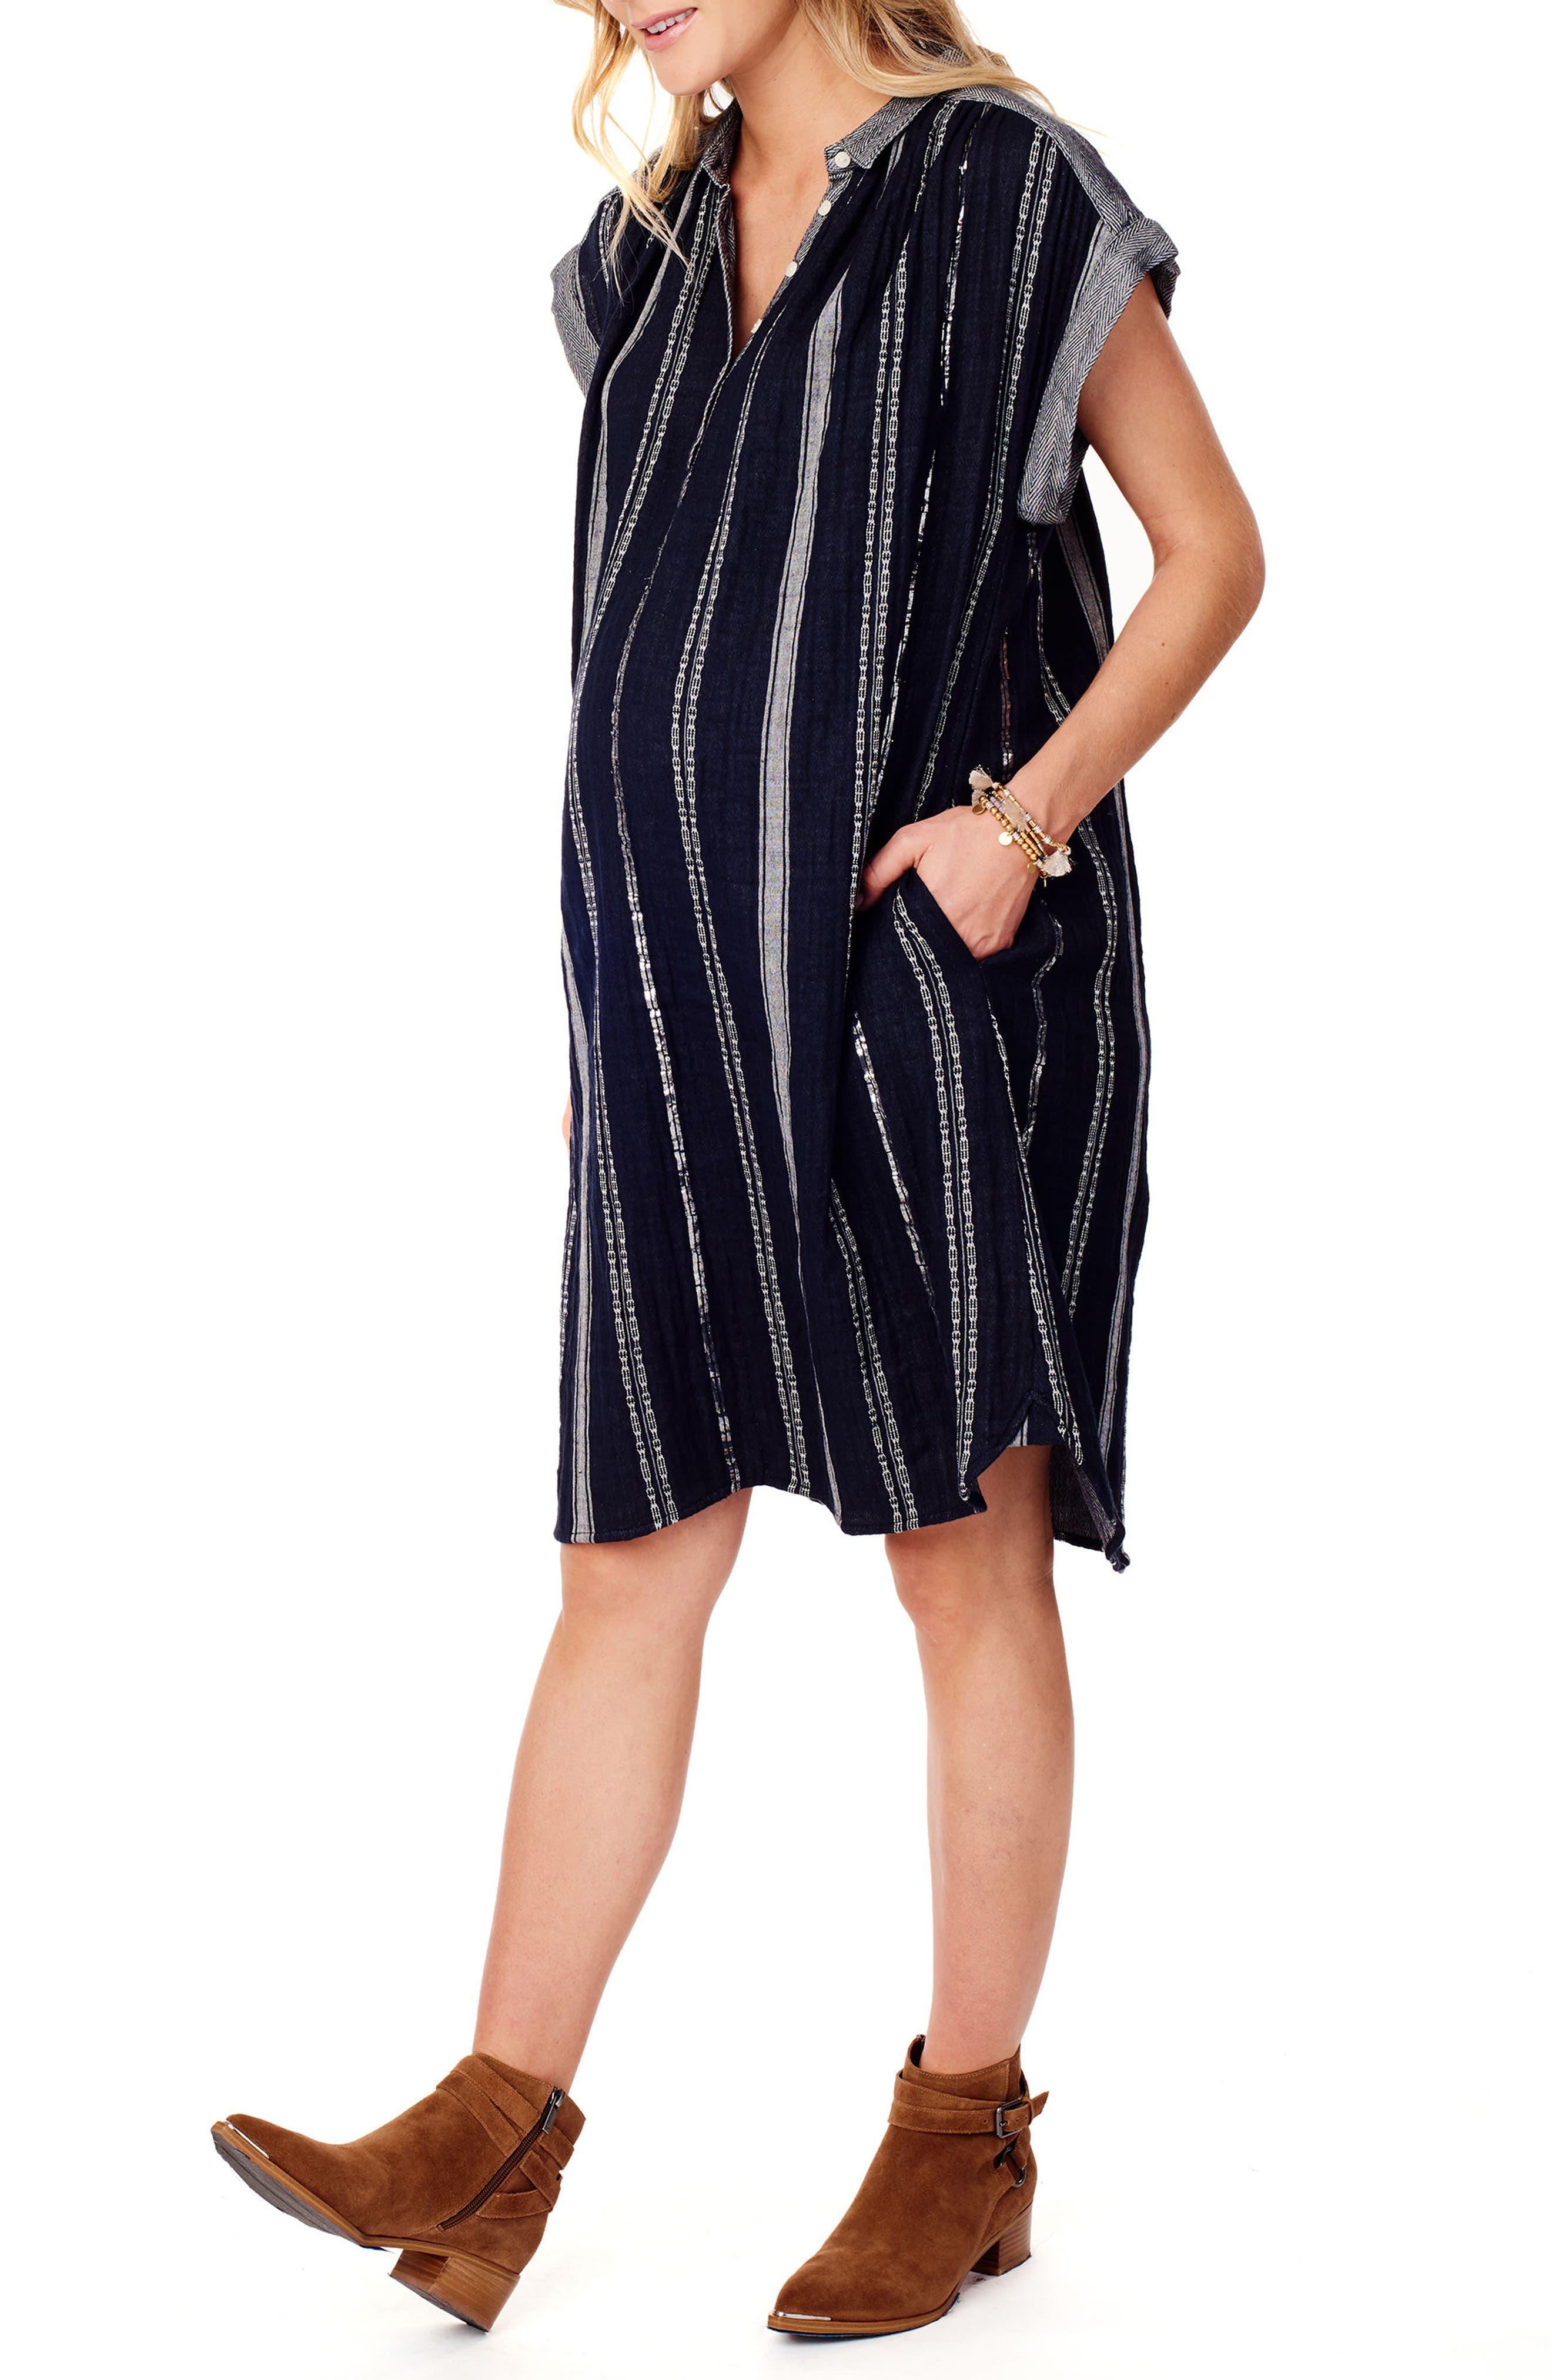 Ingrid & Isabel Maternity Shift Dress,                             Alternate thumbnail 3, color,                             True Navy Lurex Stripe